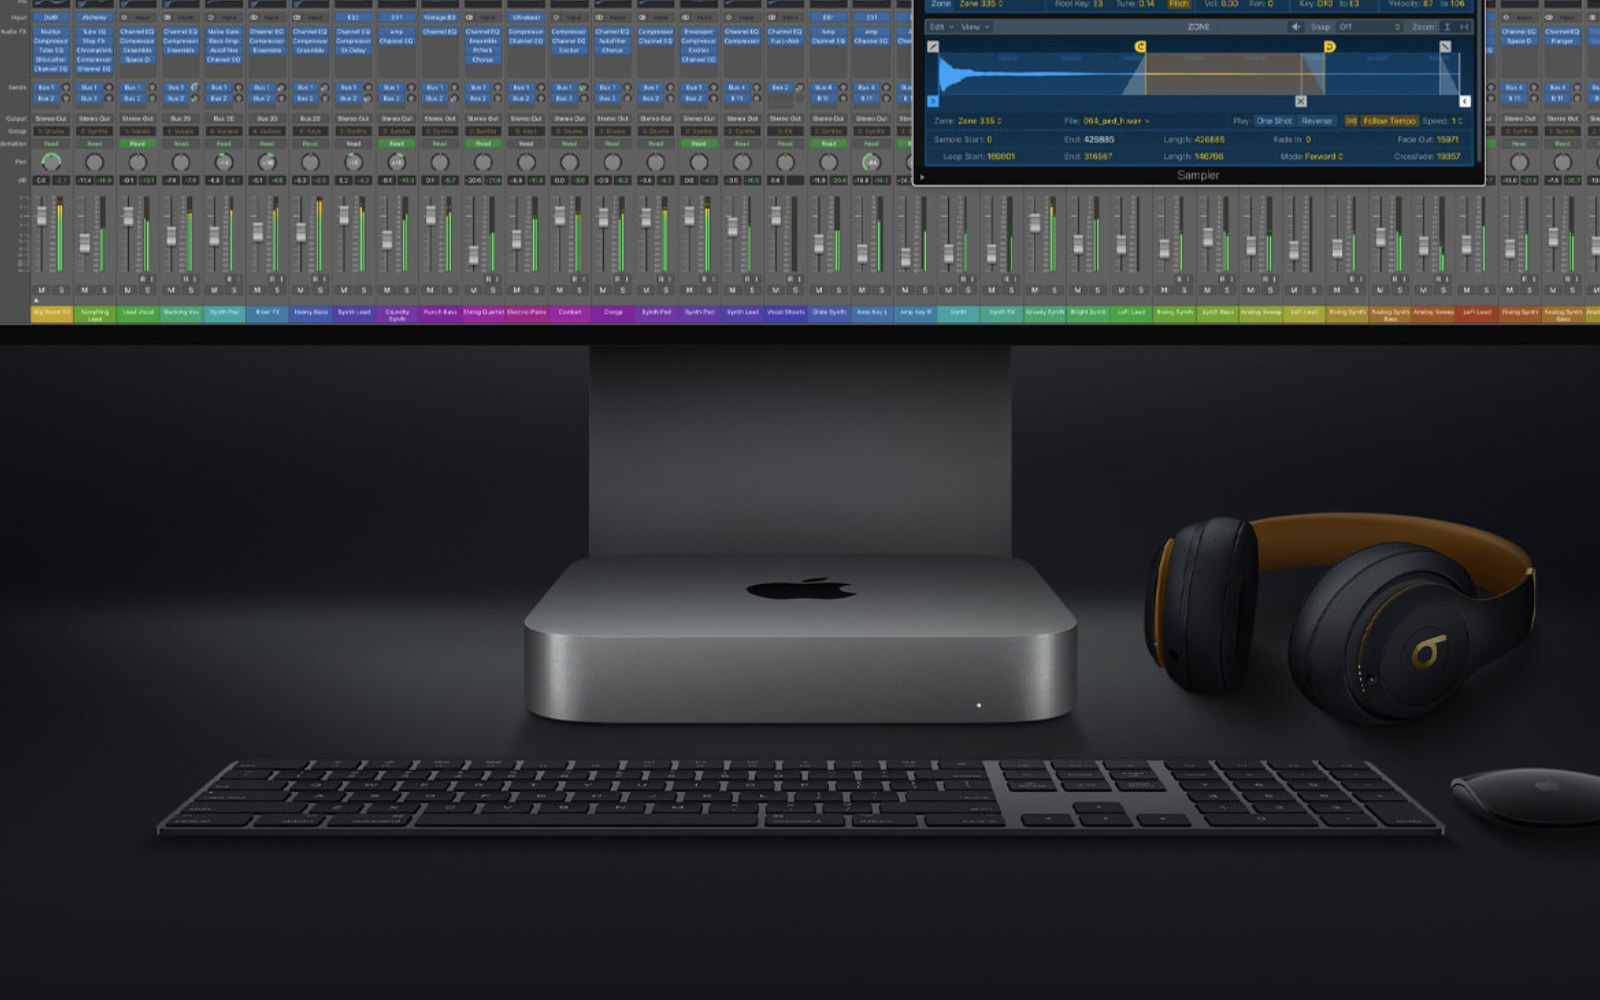 Mac mini photo